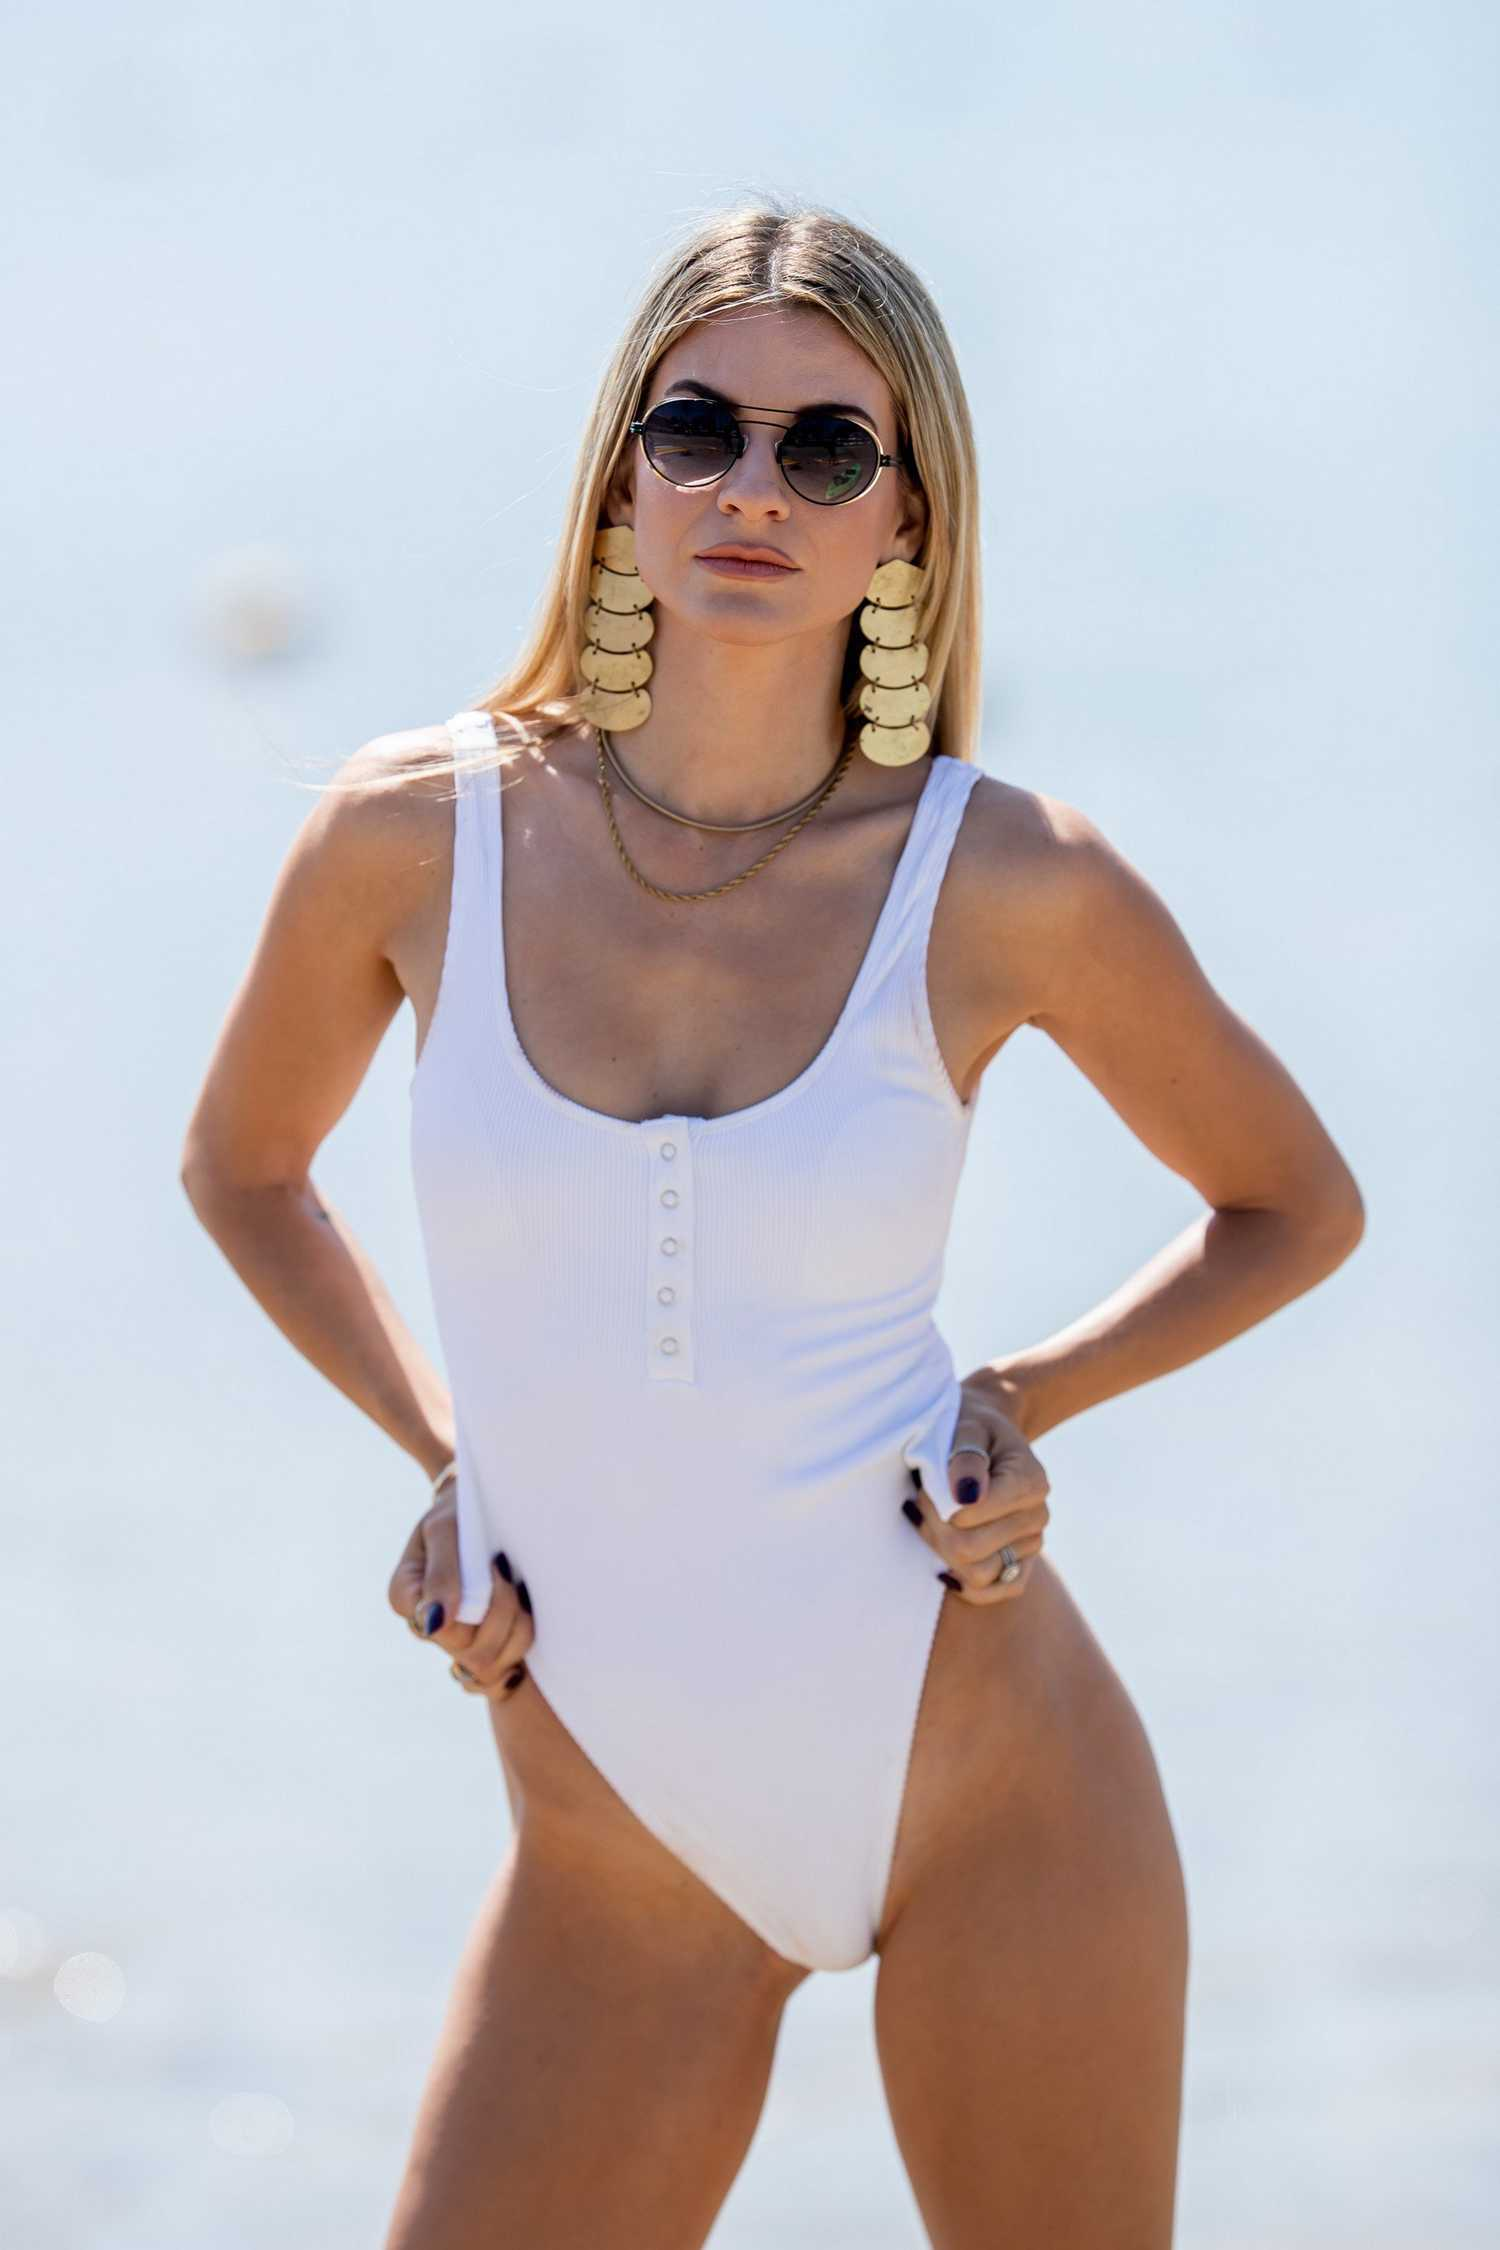 Rachel Mccord In A White Swimsuit On The Beach In Santa